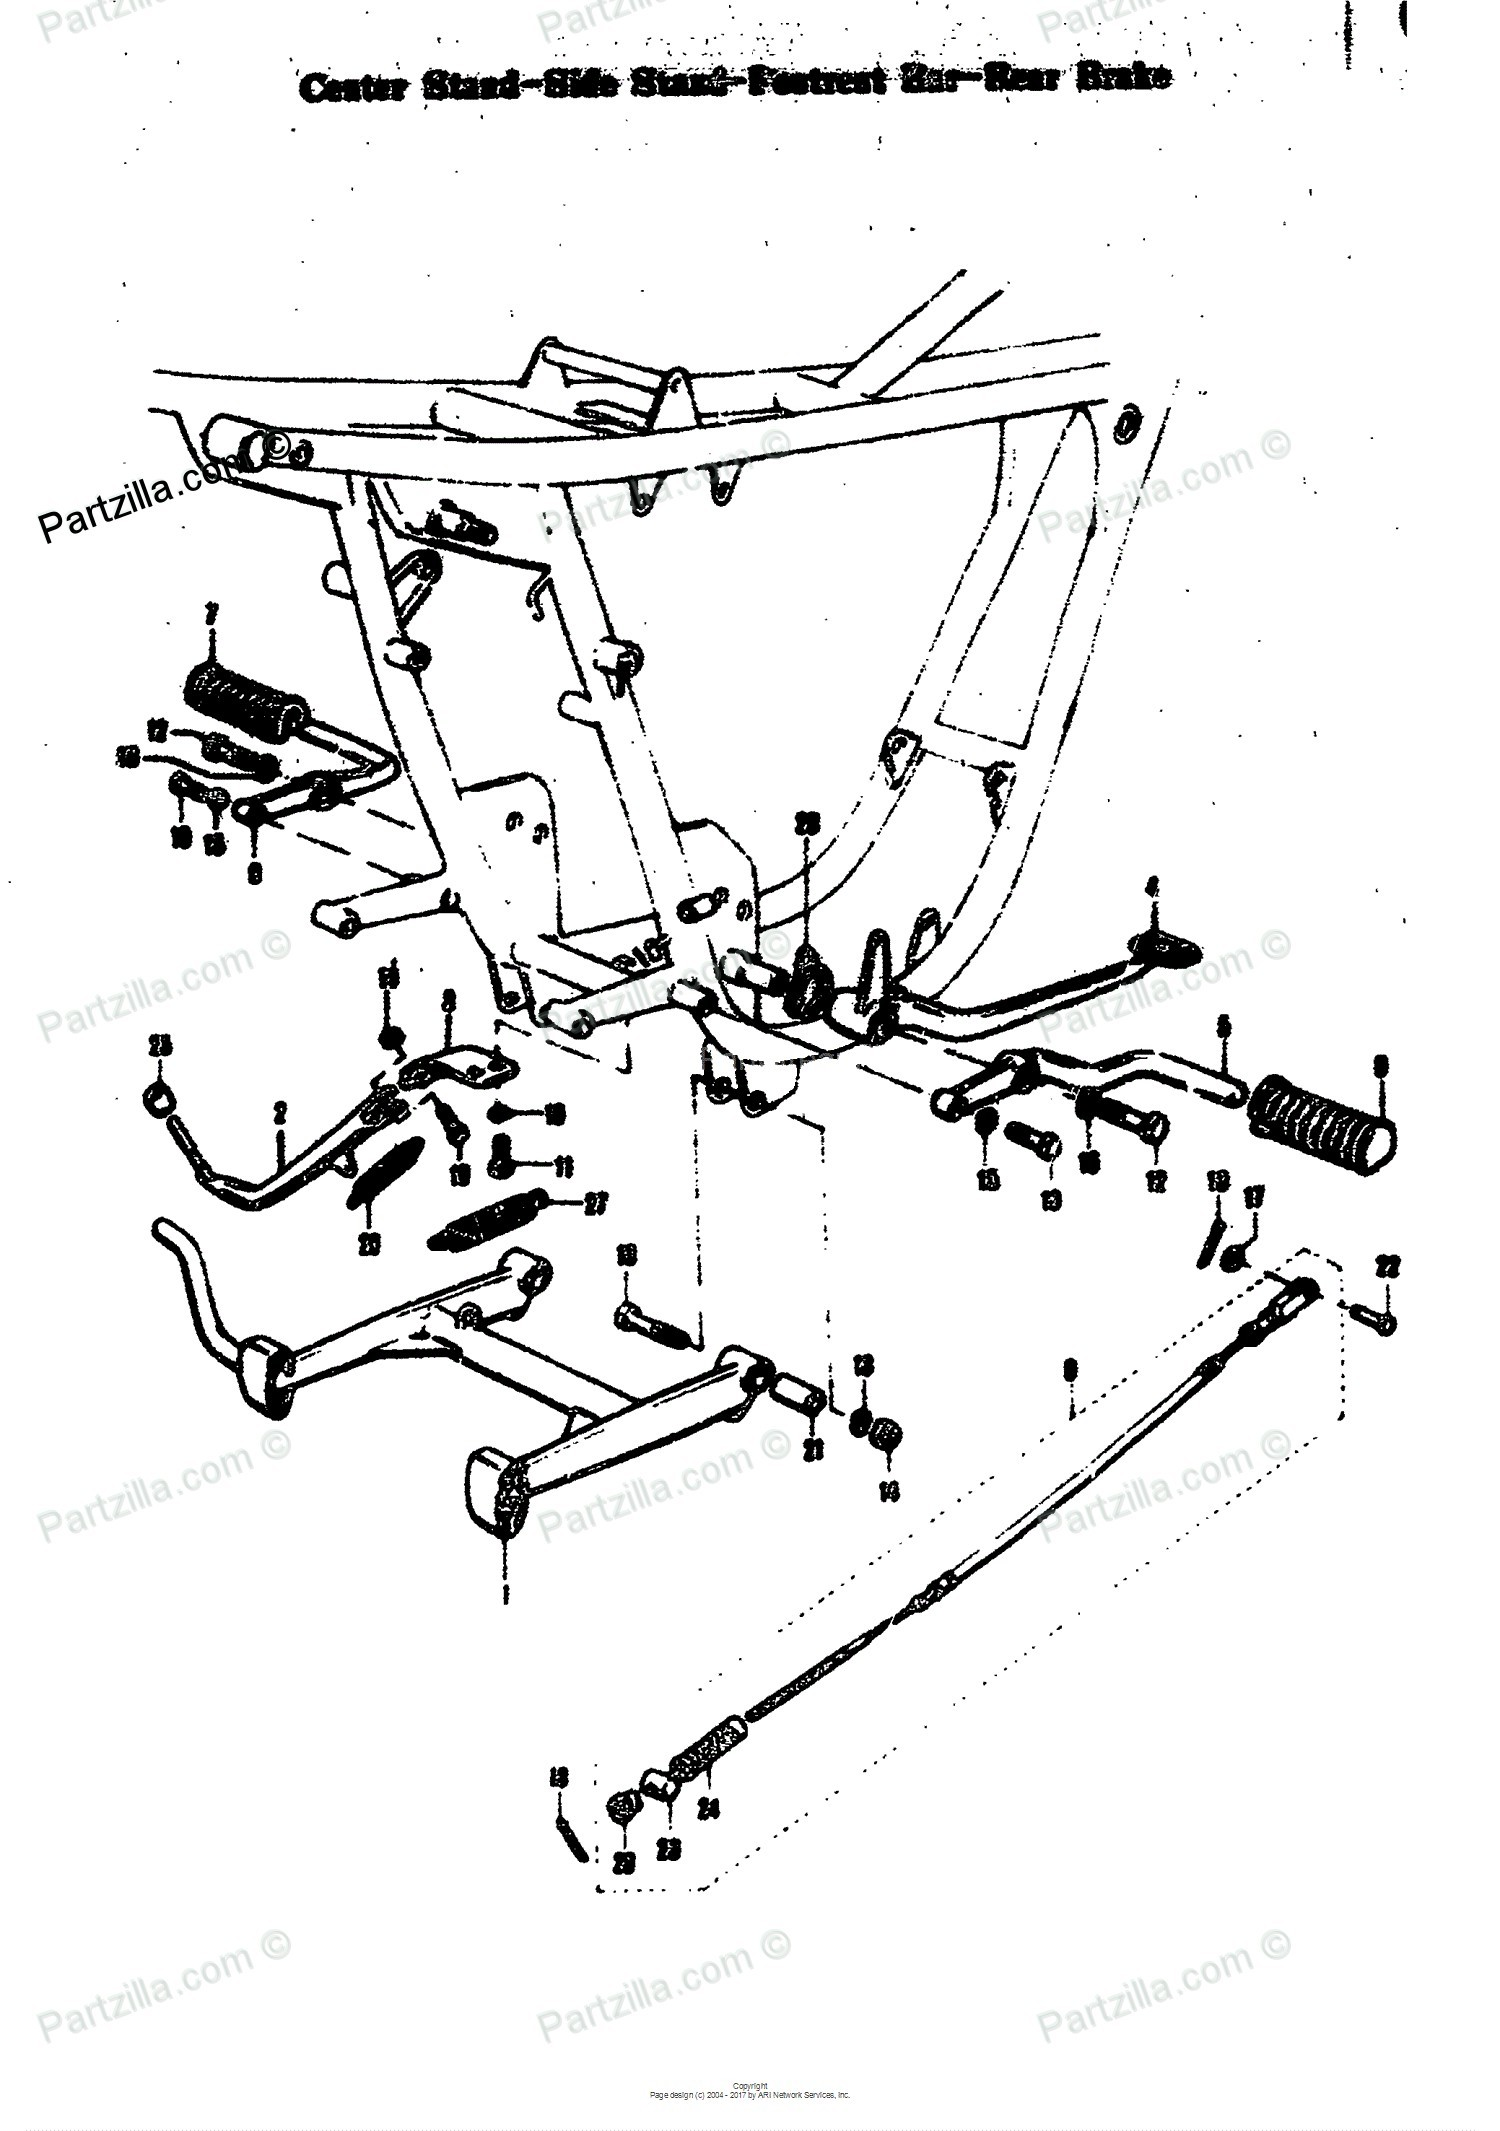 chevy drum brakes diagram wiring open source 99 grand brake vitaradrum circuit